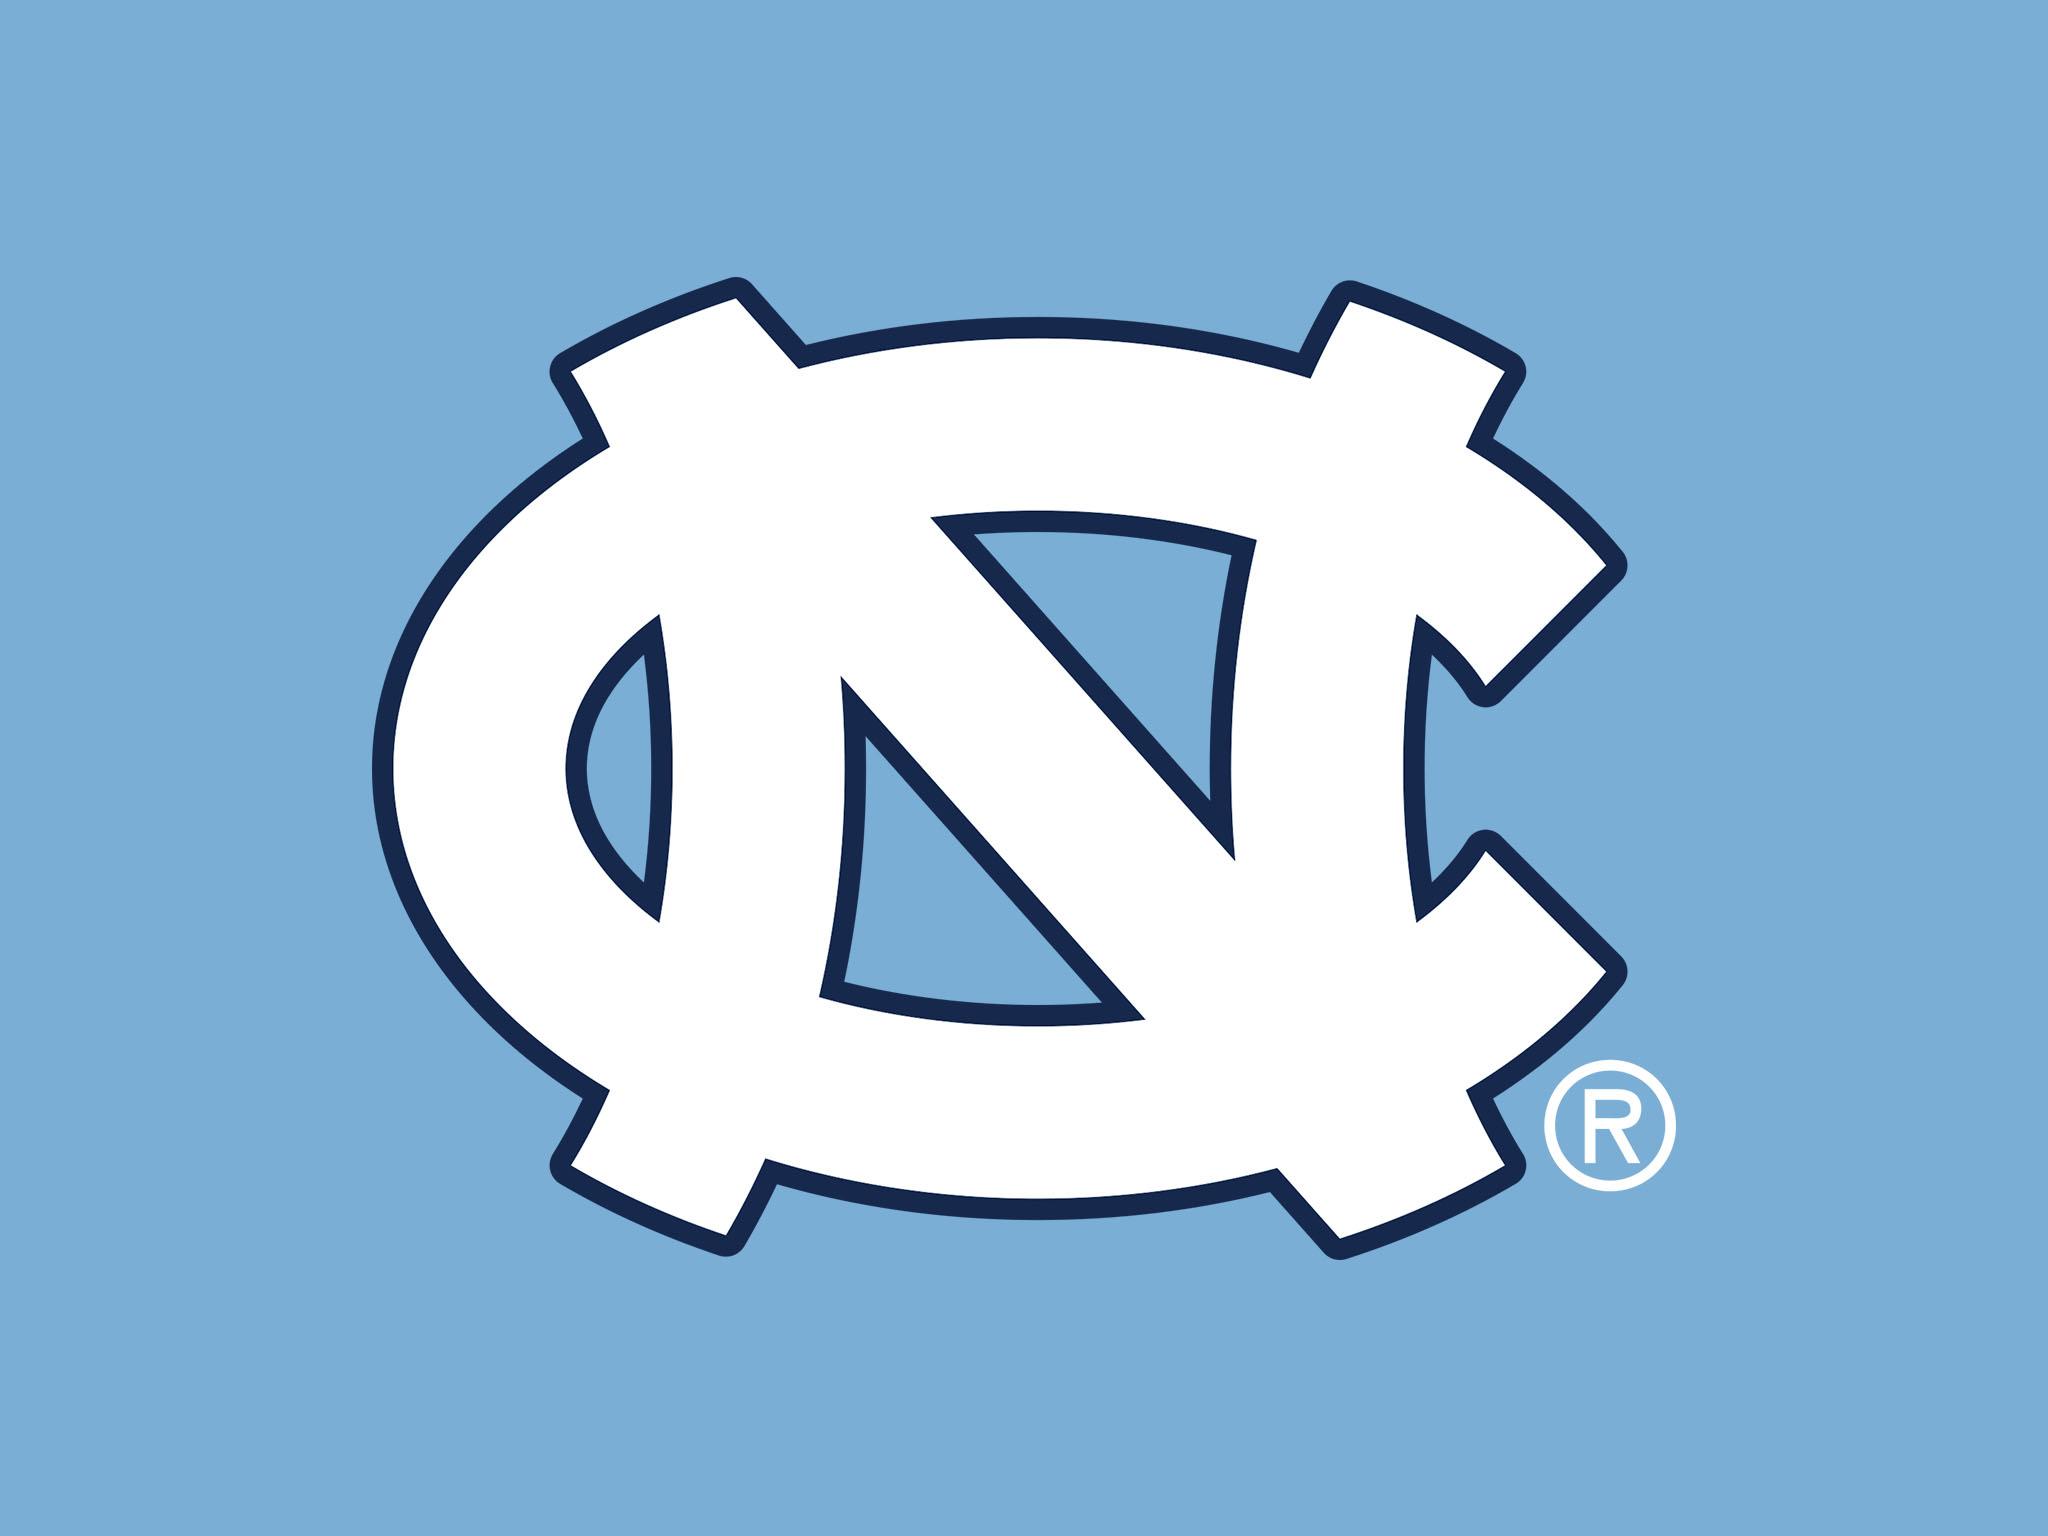 Wallpapers   University of North Carolina Athletics 2048x1536